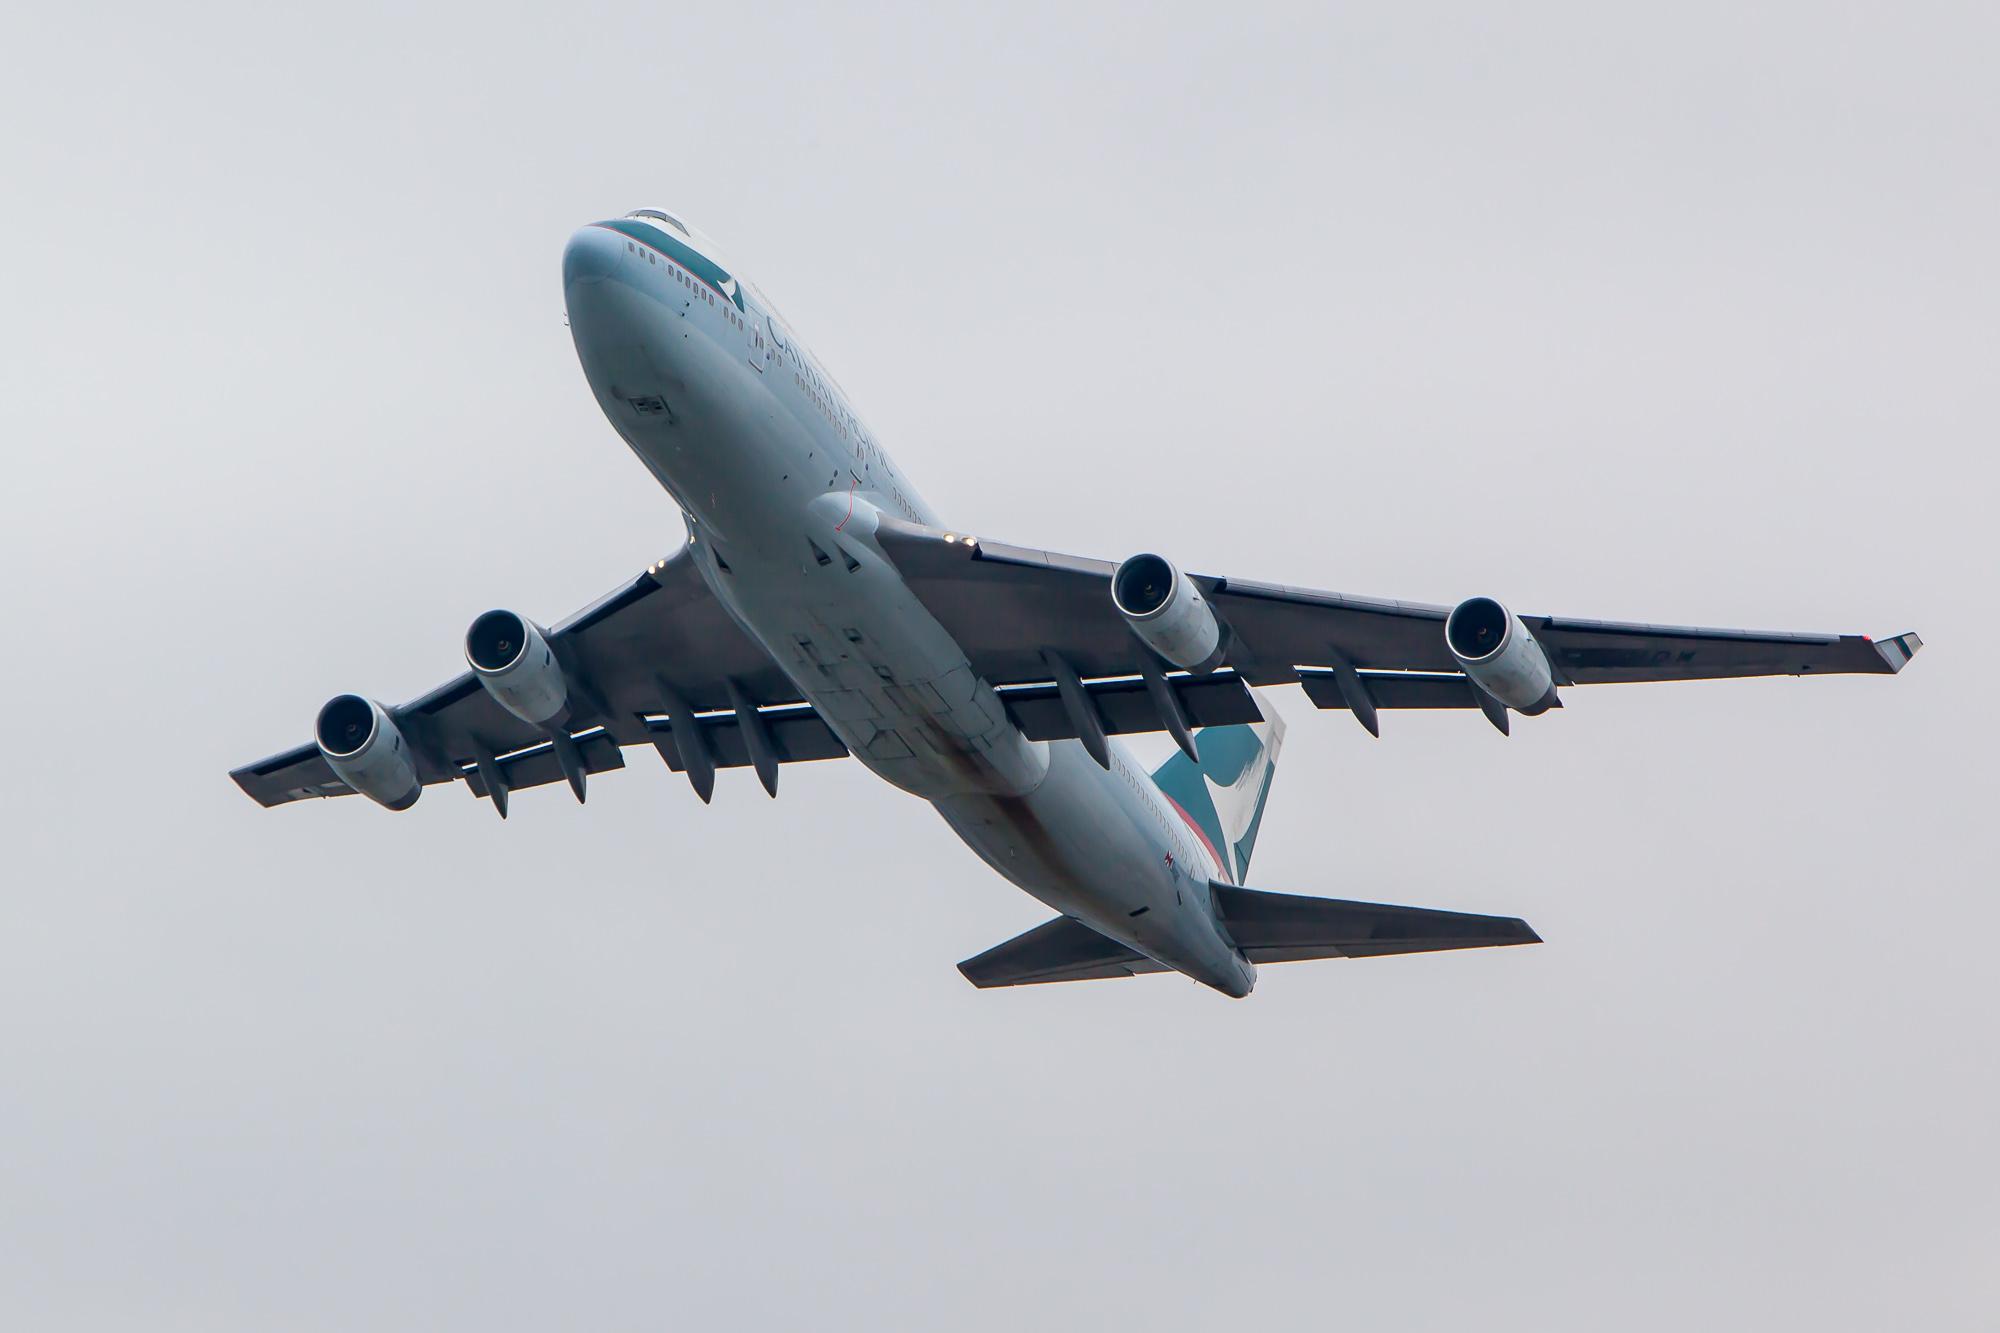 Plane Spotting in Hong Kong